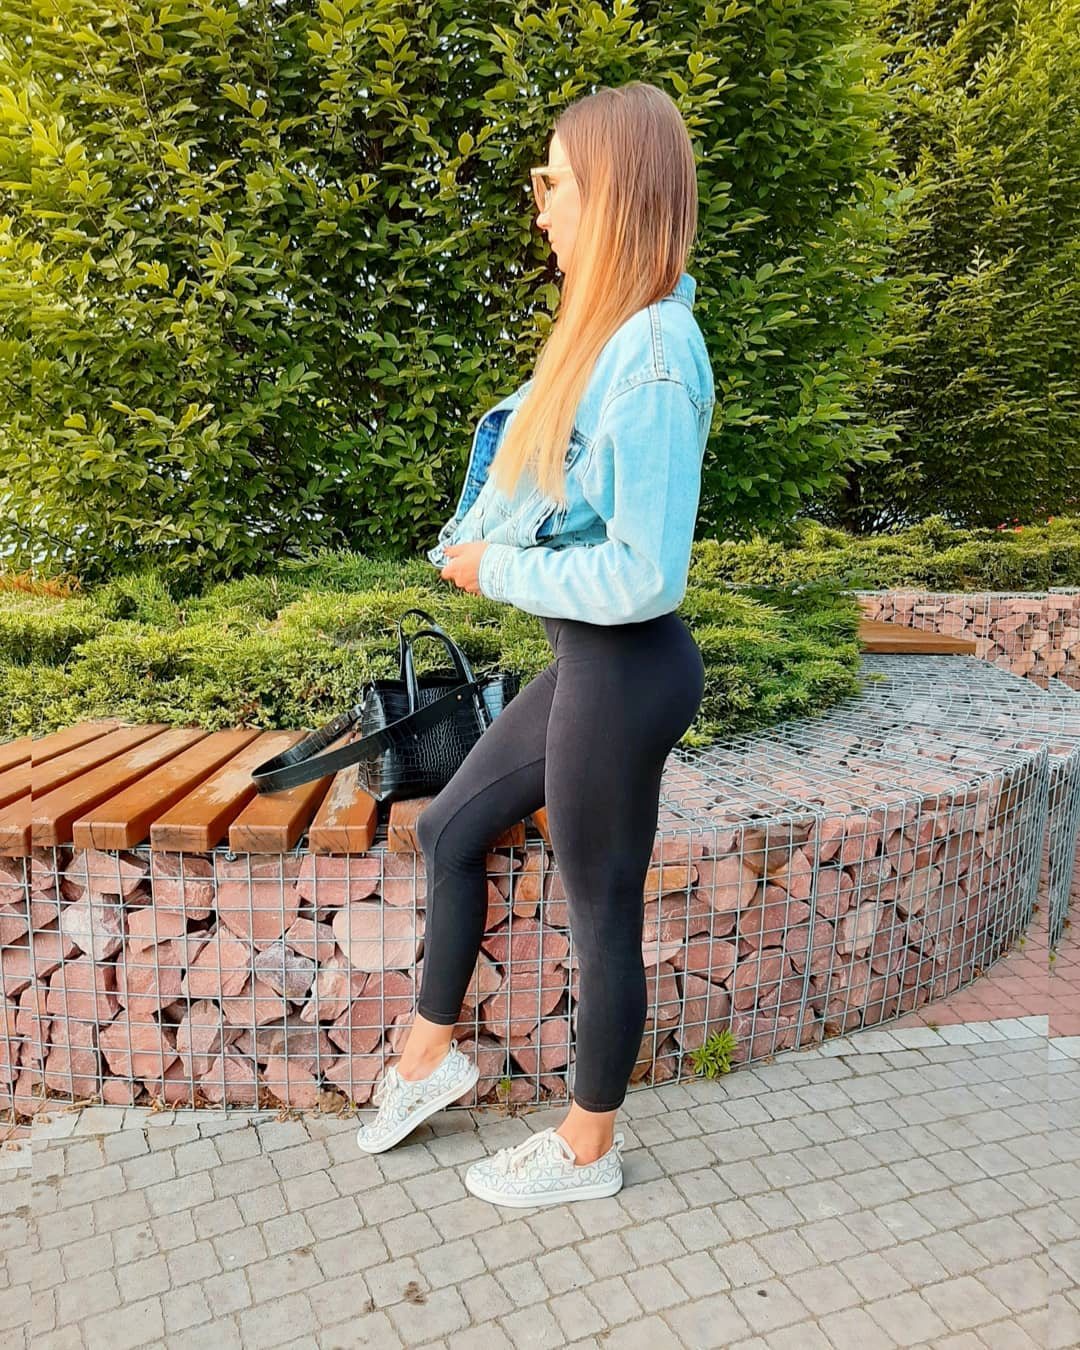 Alinka-Vladimirova-Wallpapers-Insta-Fit-Bio-4